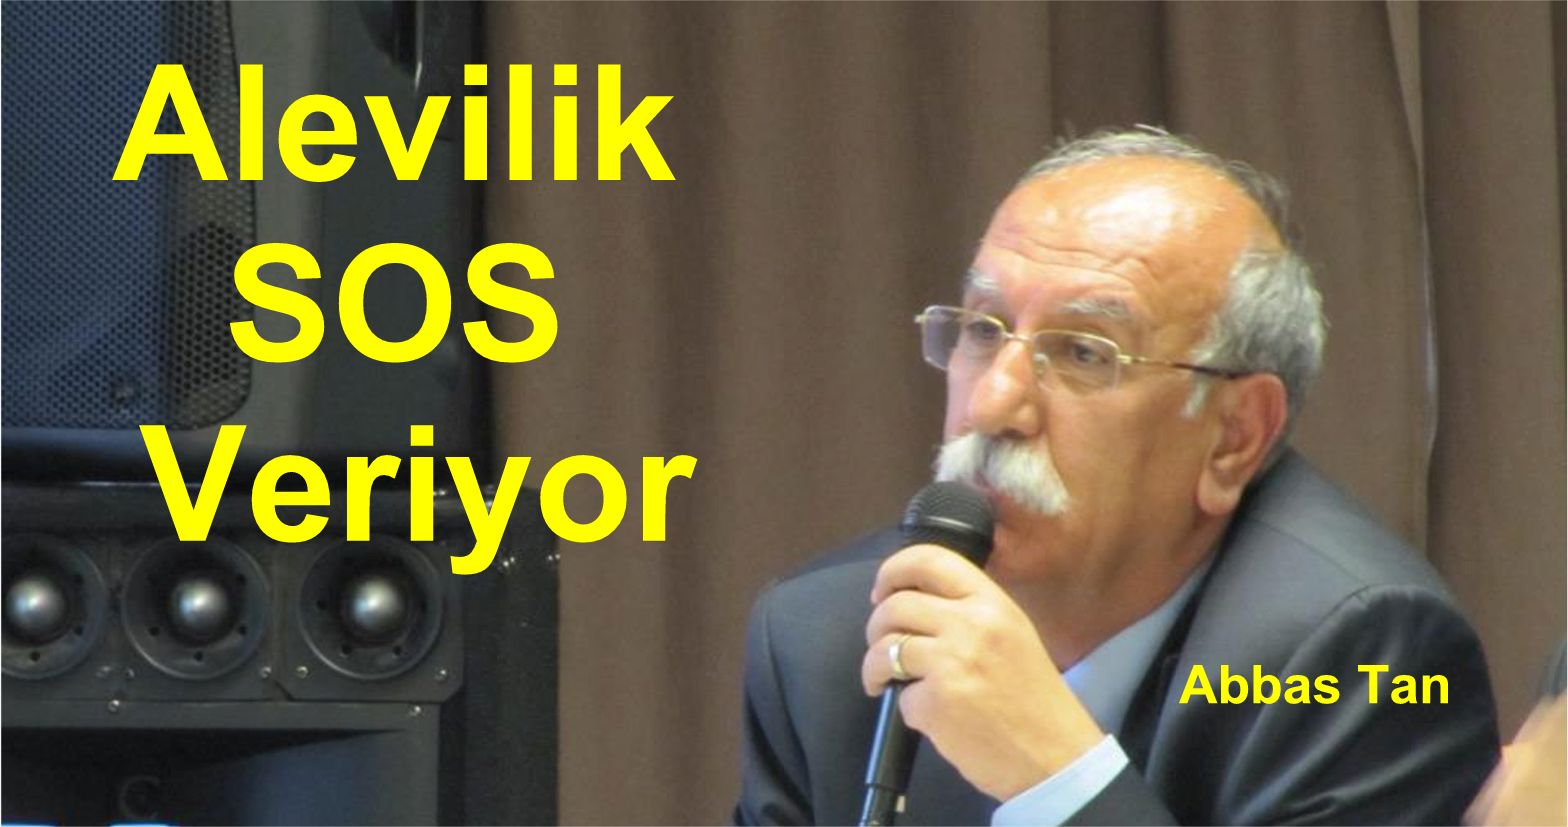 Abbas TAN Alevlik sos veriyor Devrimci Aleviler pir sultan HBV kizilbas semah